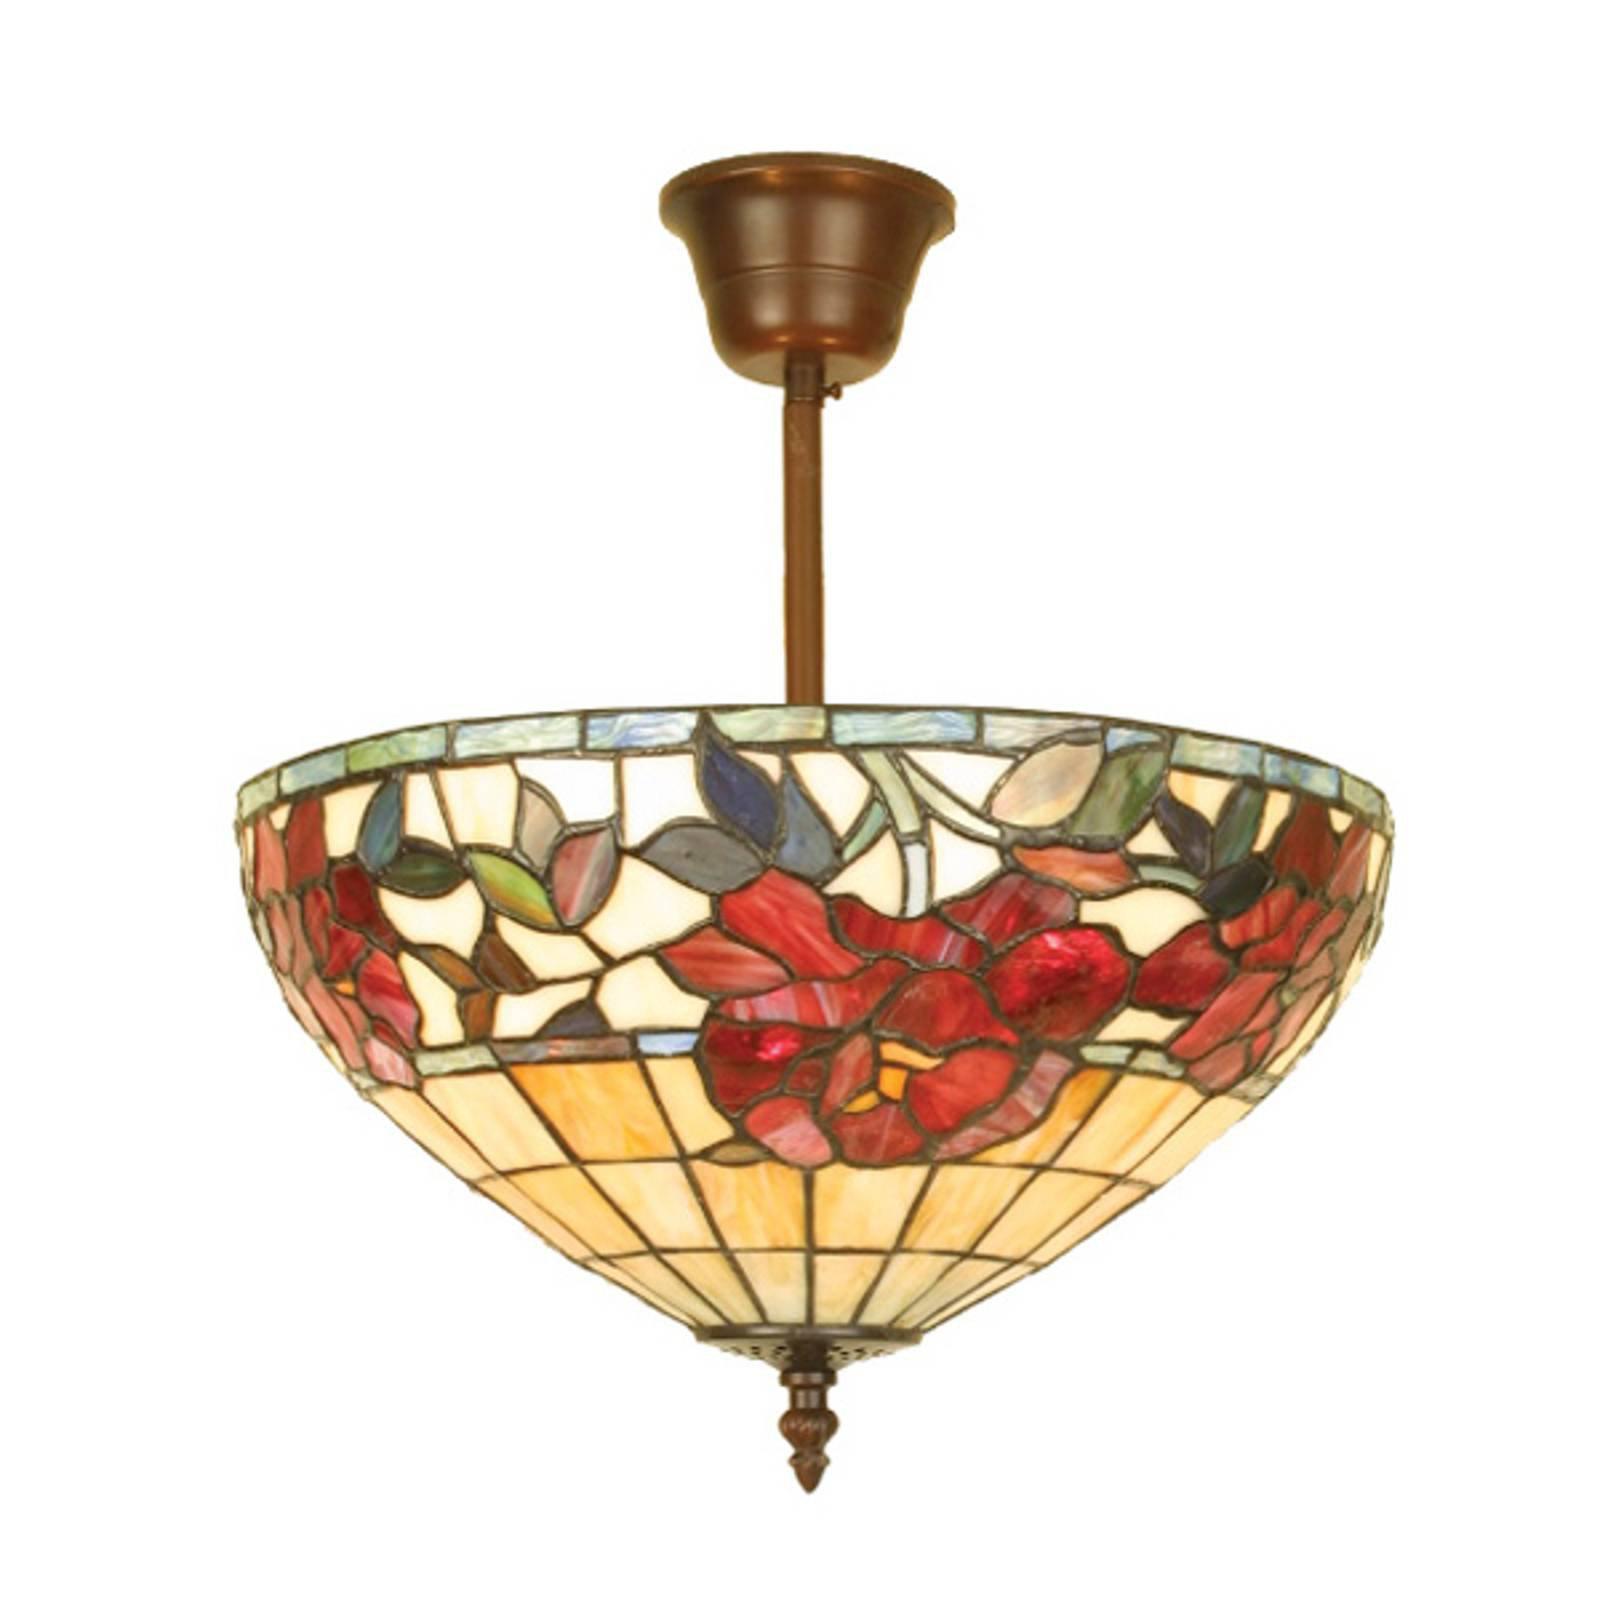 Finna taklampe i Tiffany-stil